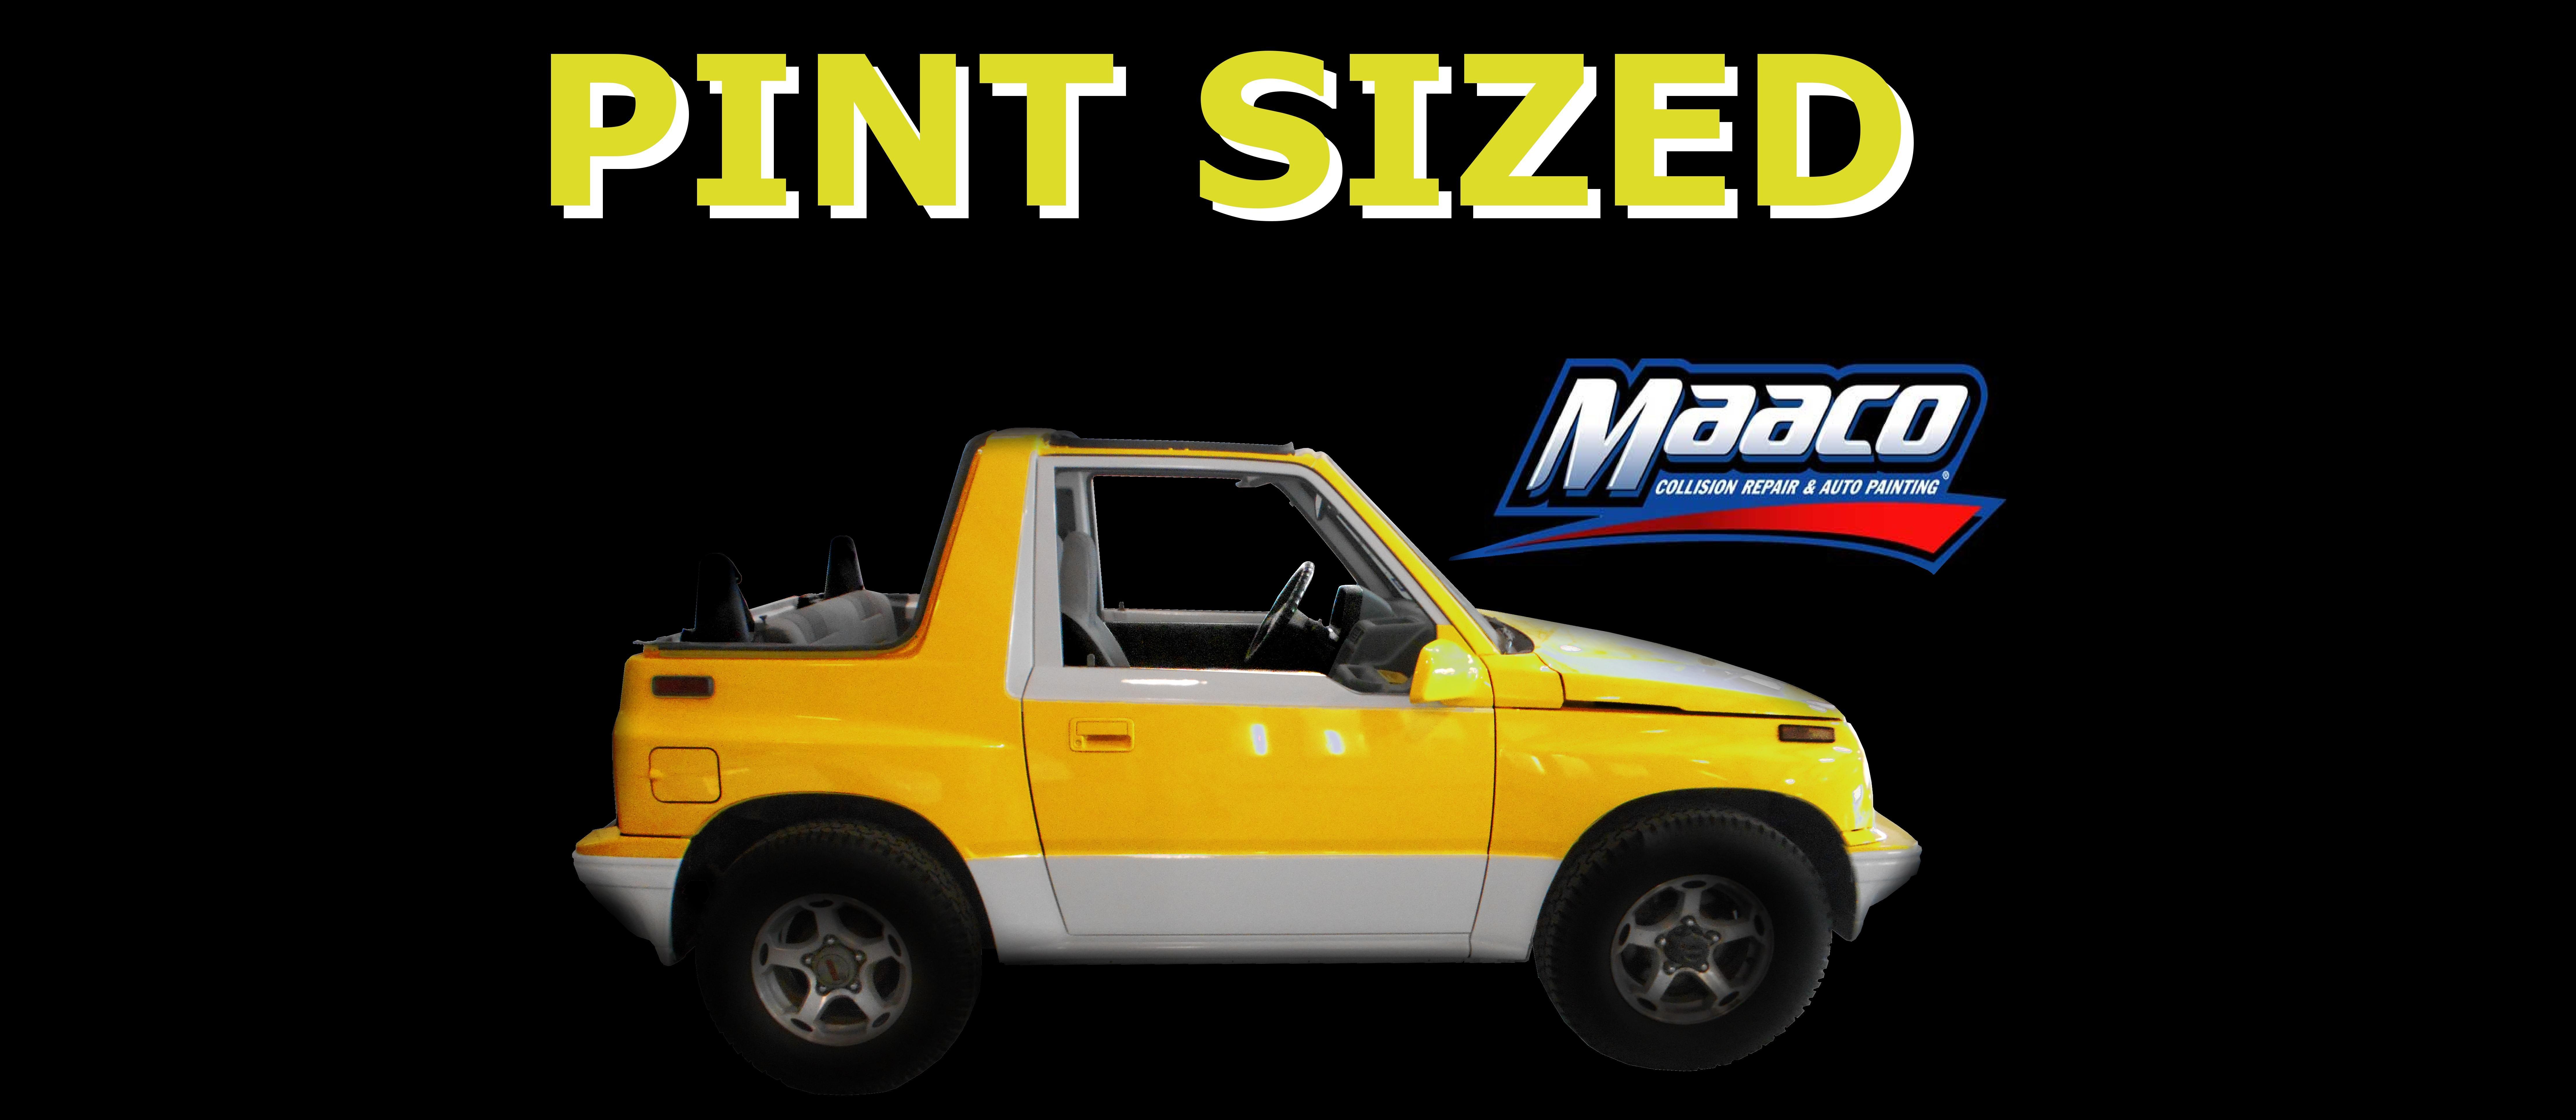 maaco collision repair auto painting league city texas tx. Black Bedroom Furniture Sets. Home Design Ideas